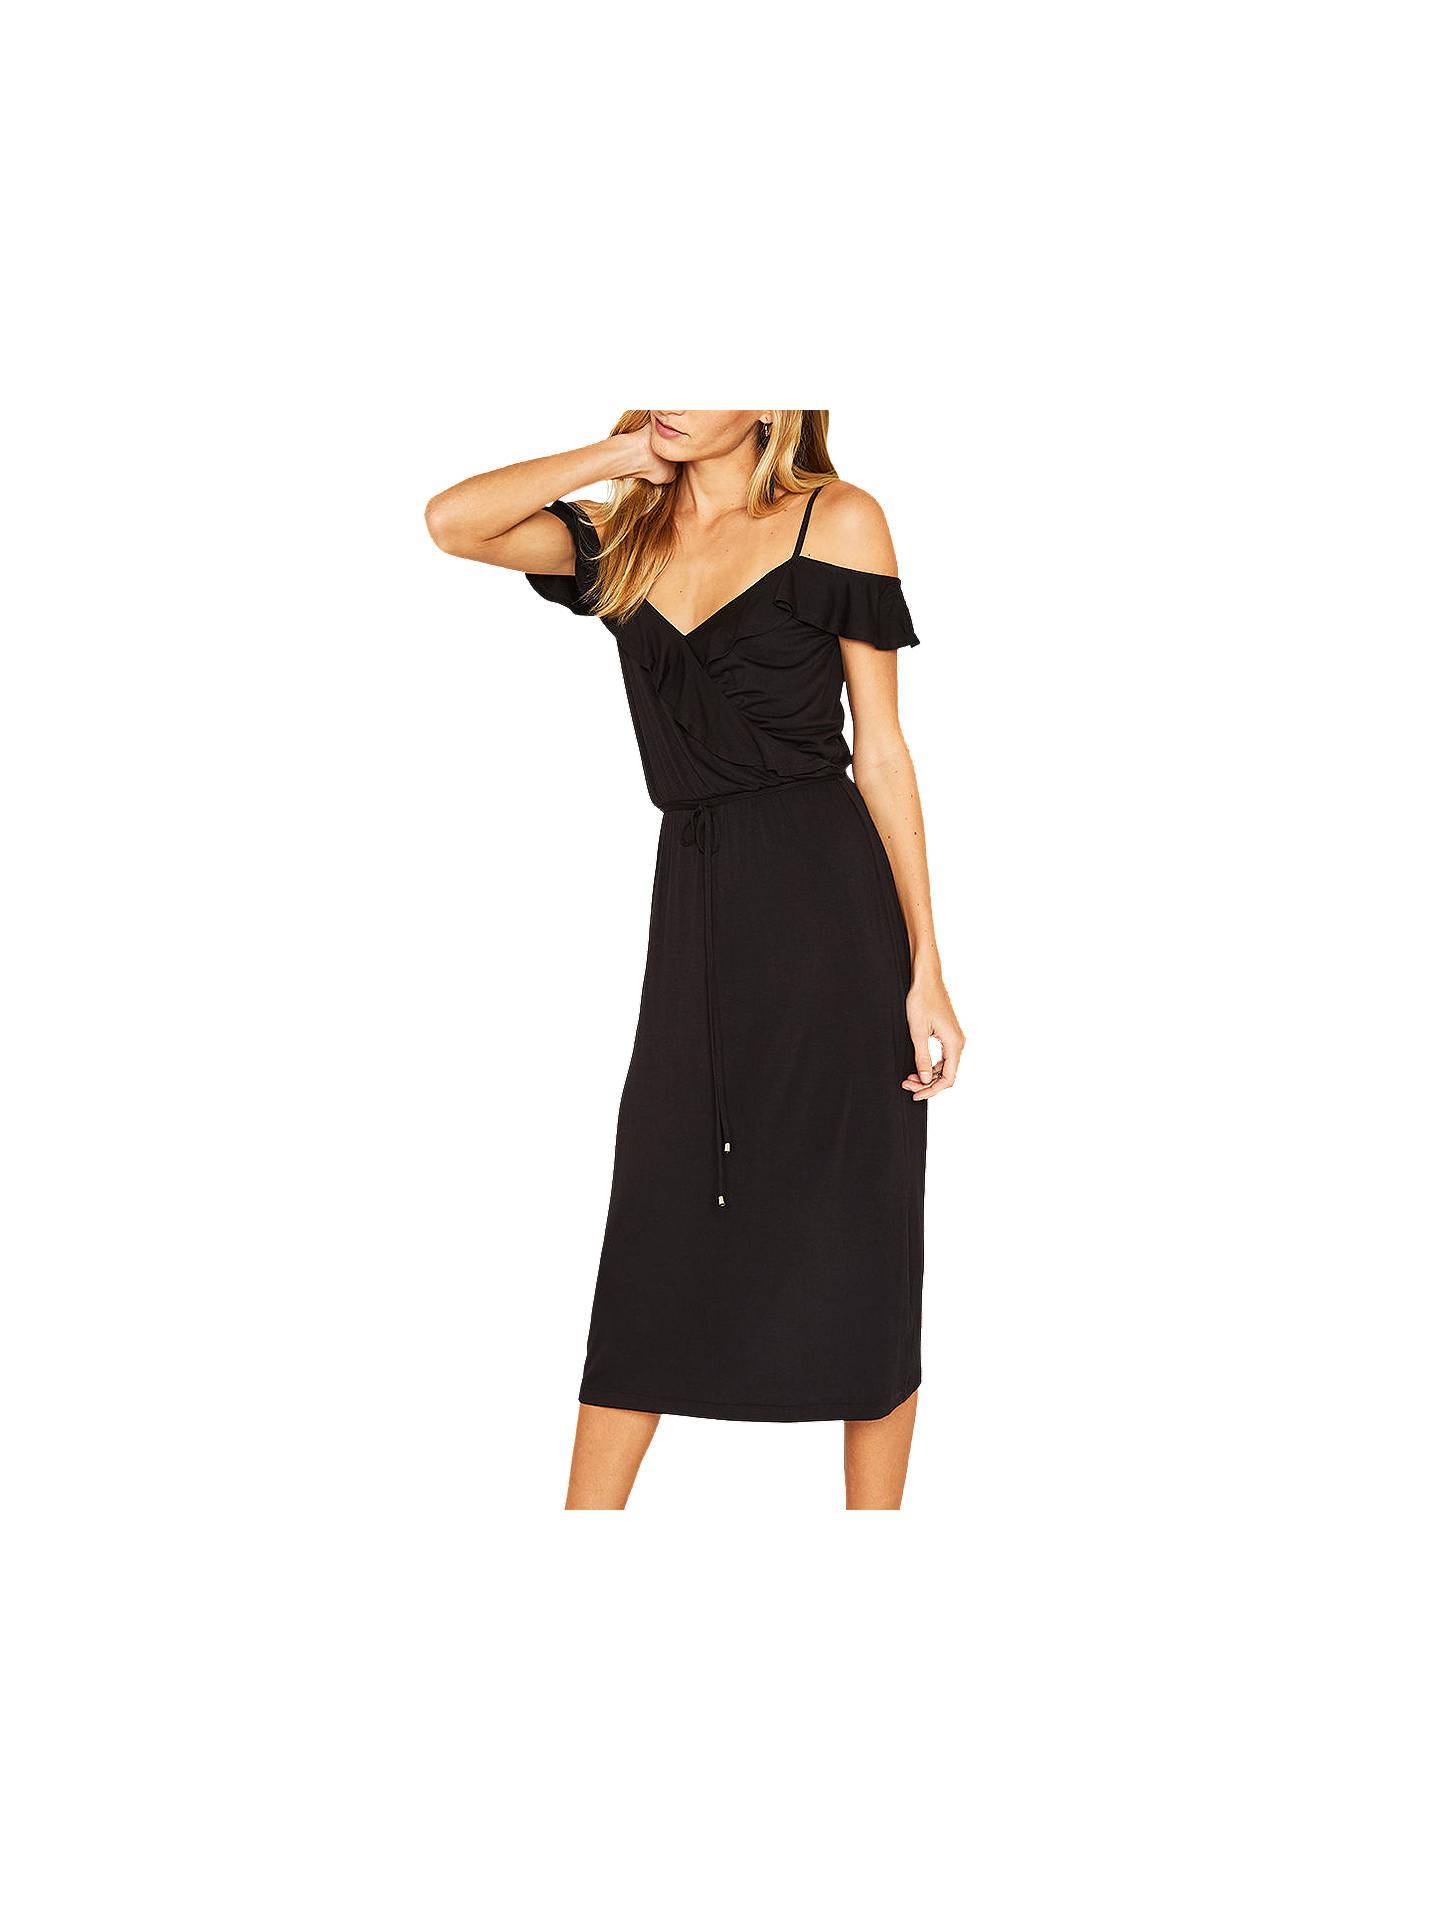 5e454c7bcd5c Buy Oasis Ruffle Wrap Midi Dress, Black, XS Online at johnlewis.com ...